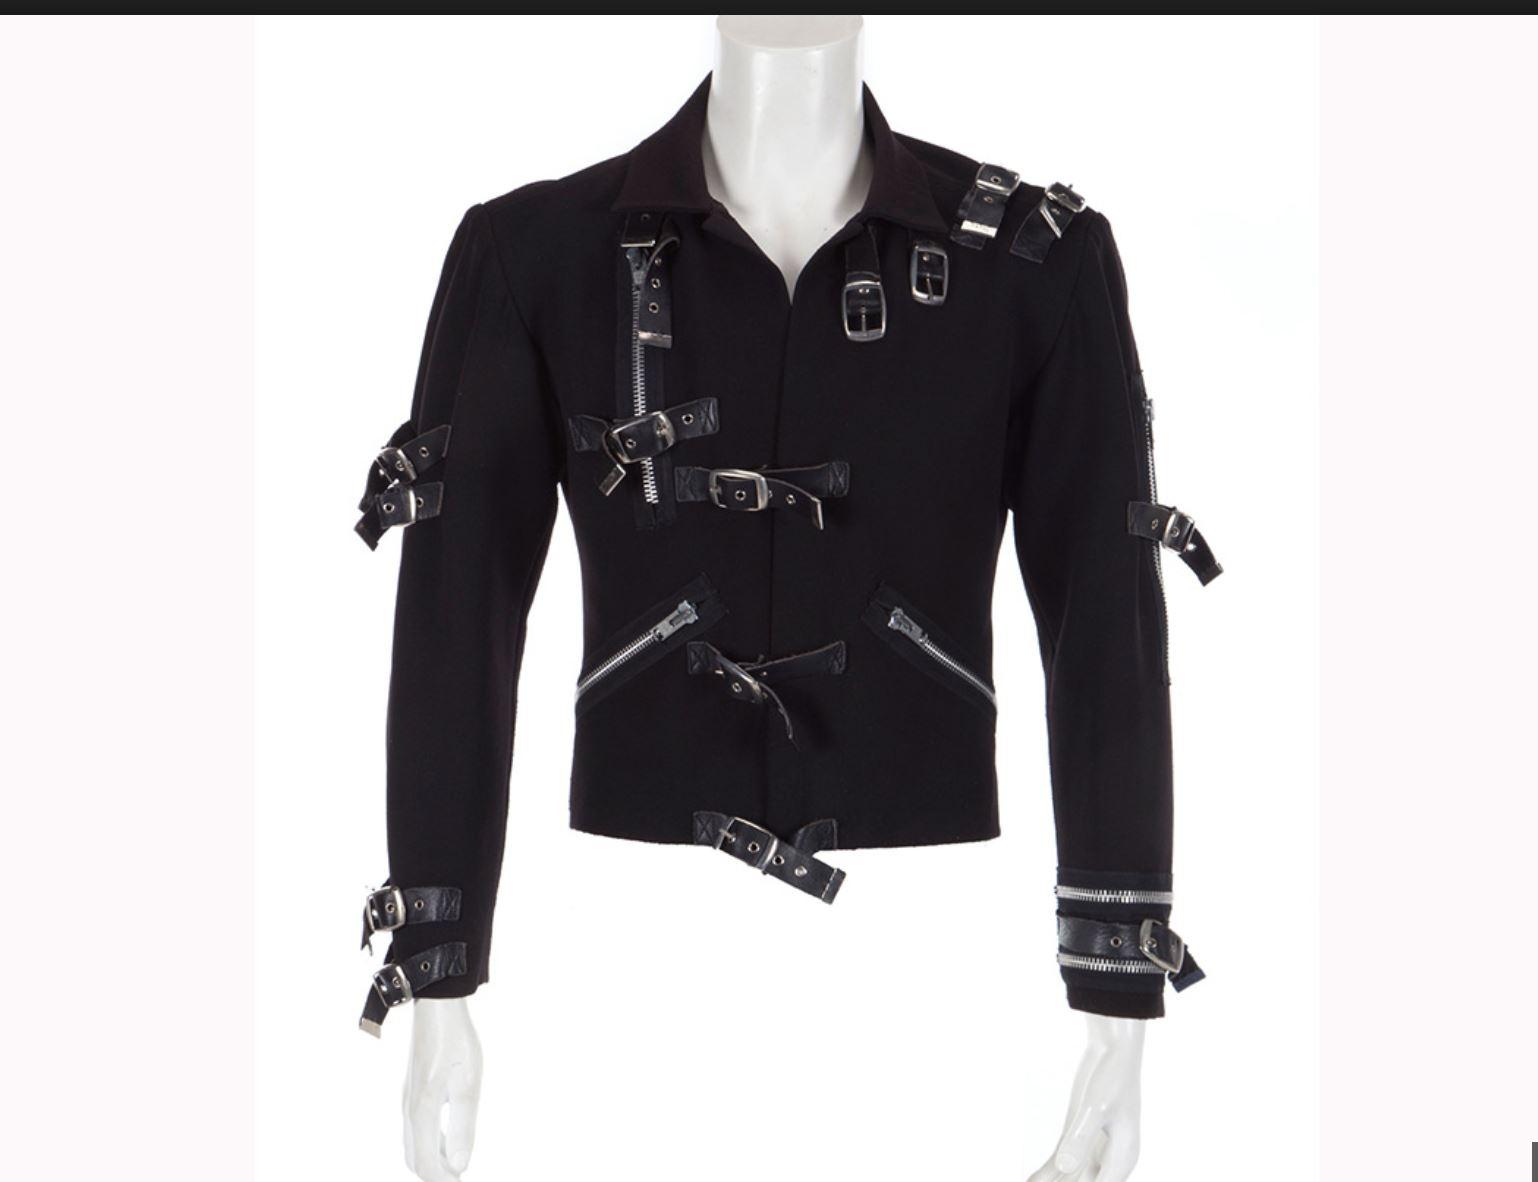 Micheal Jackson's jacket